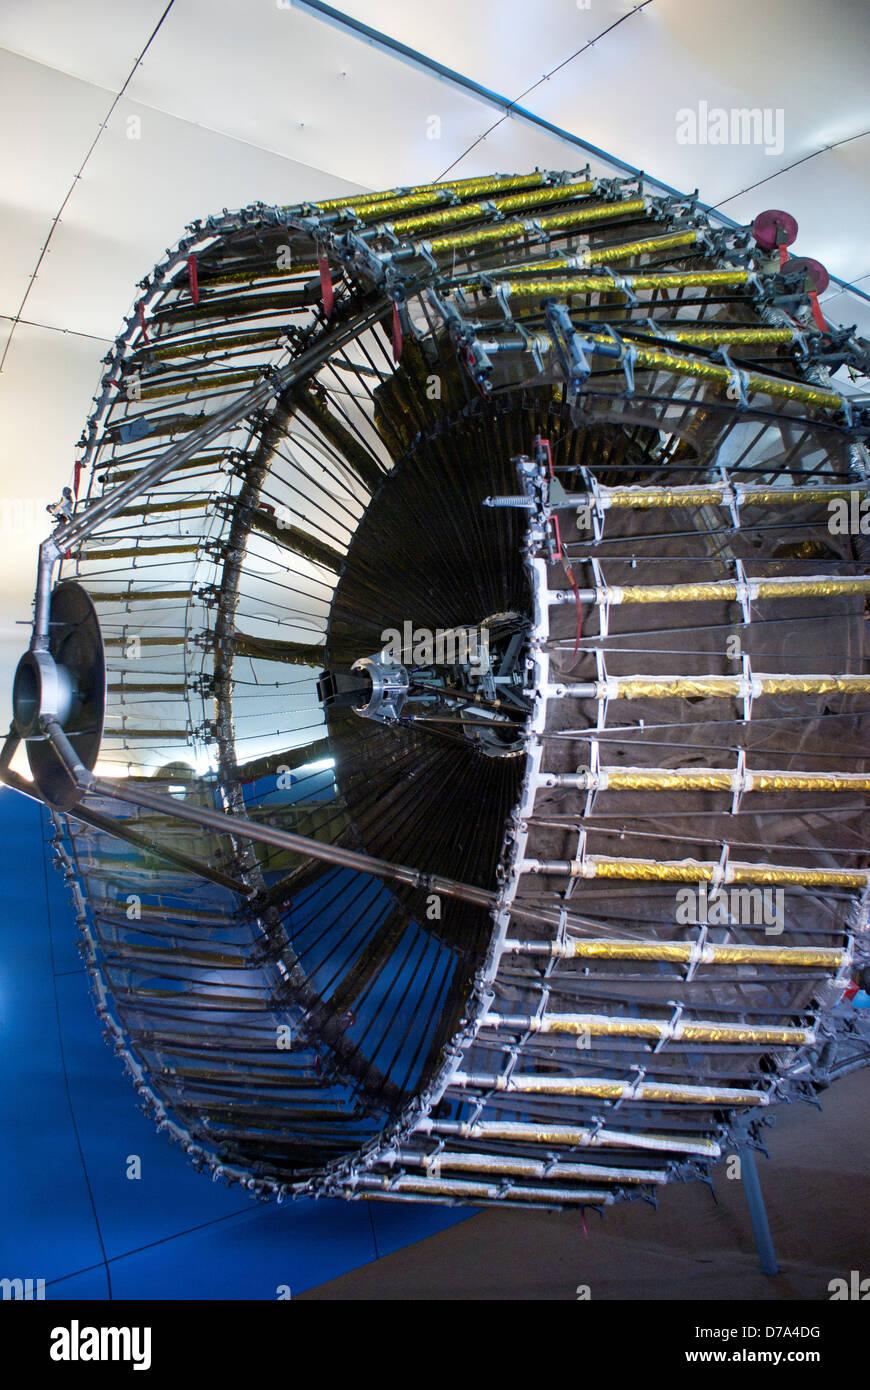 Satellite antenna display museum Periphery antenna deployable to increase collecting area therefore gain Baikonur - Stock Image